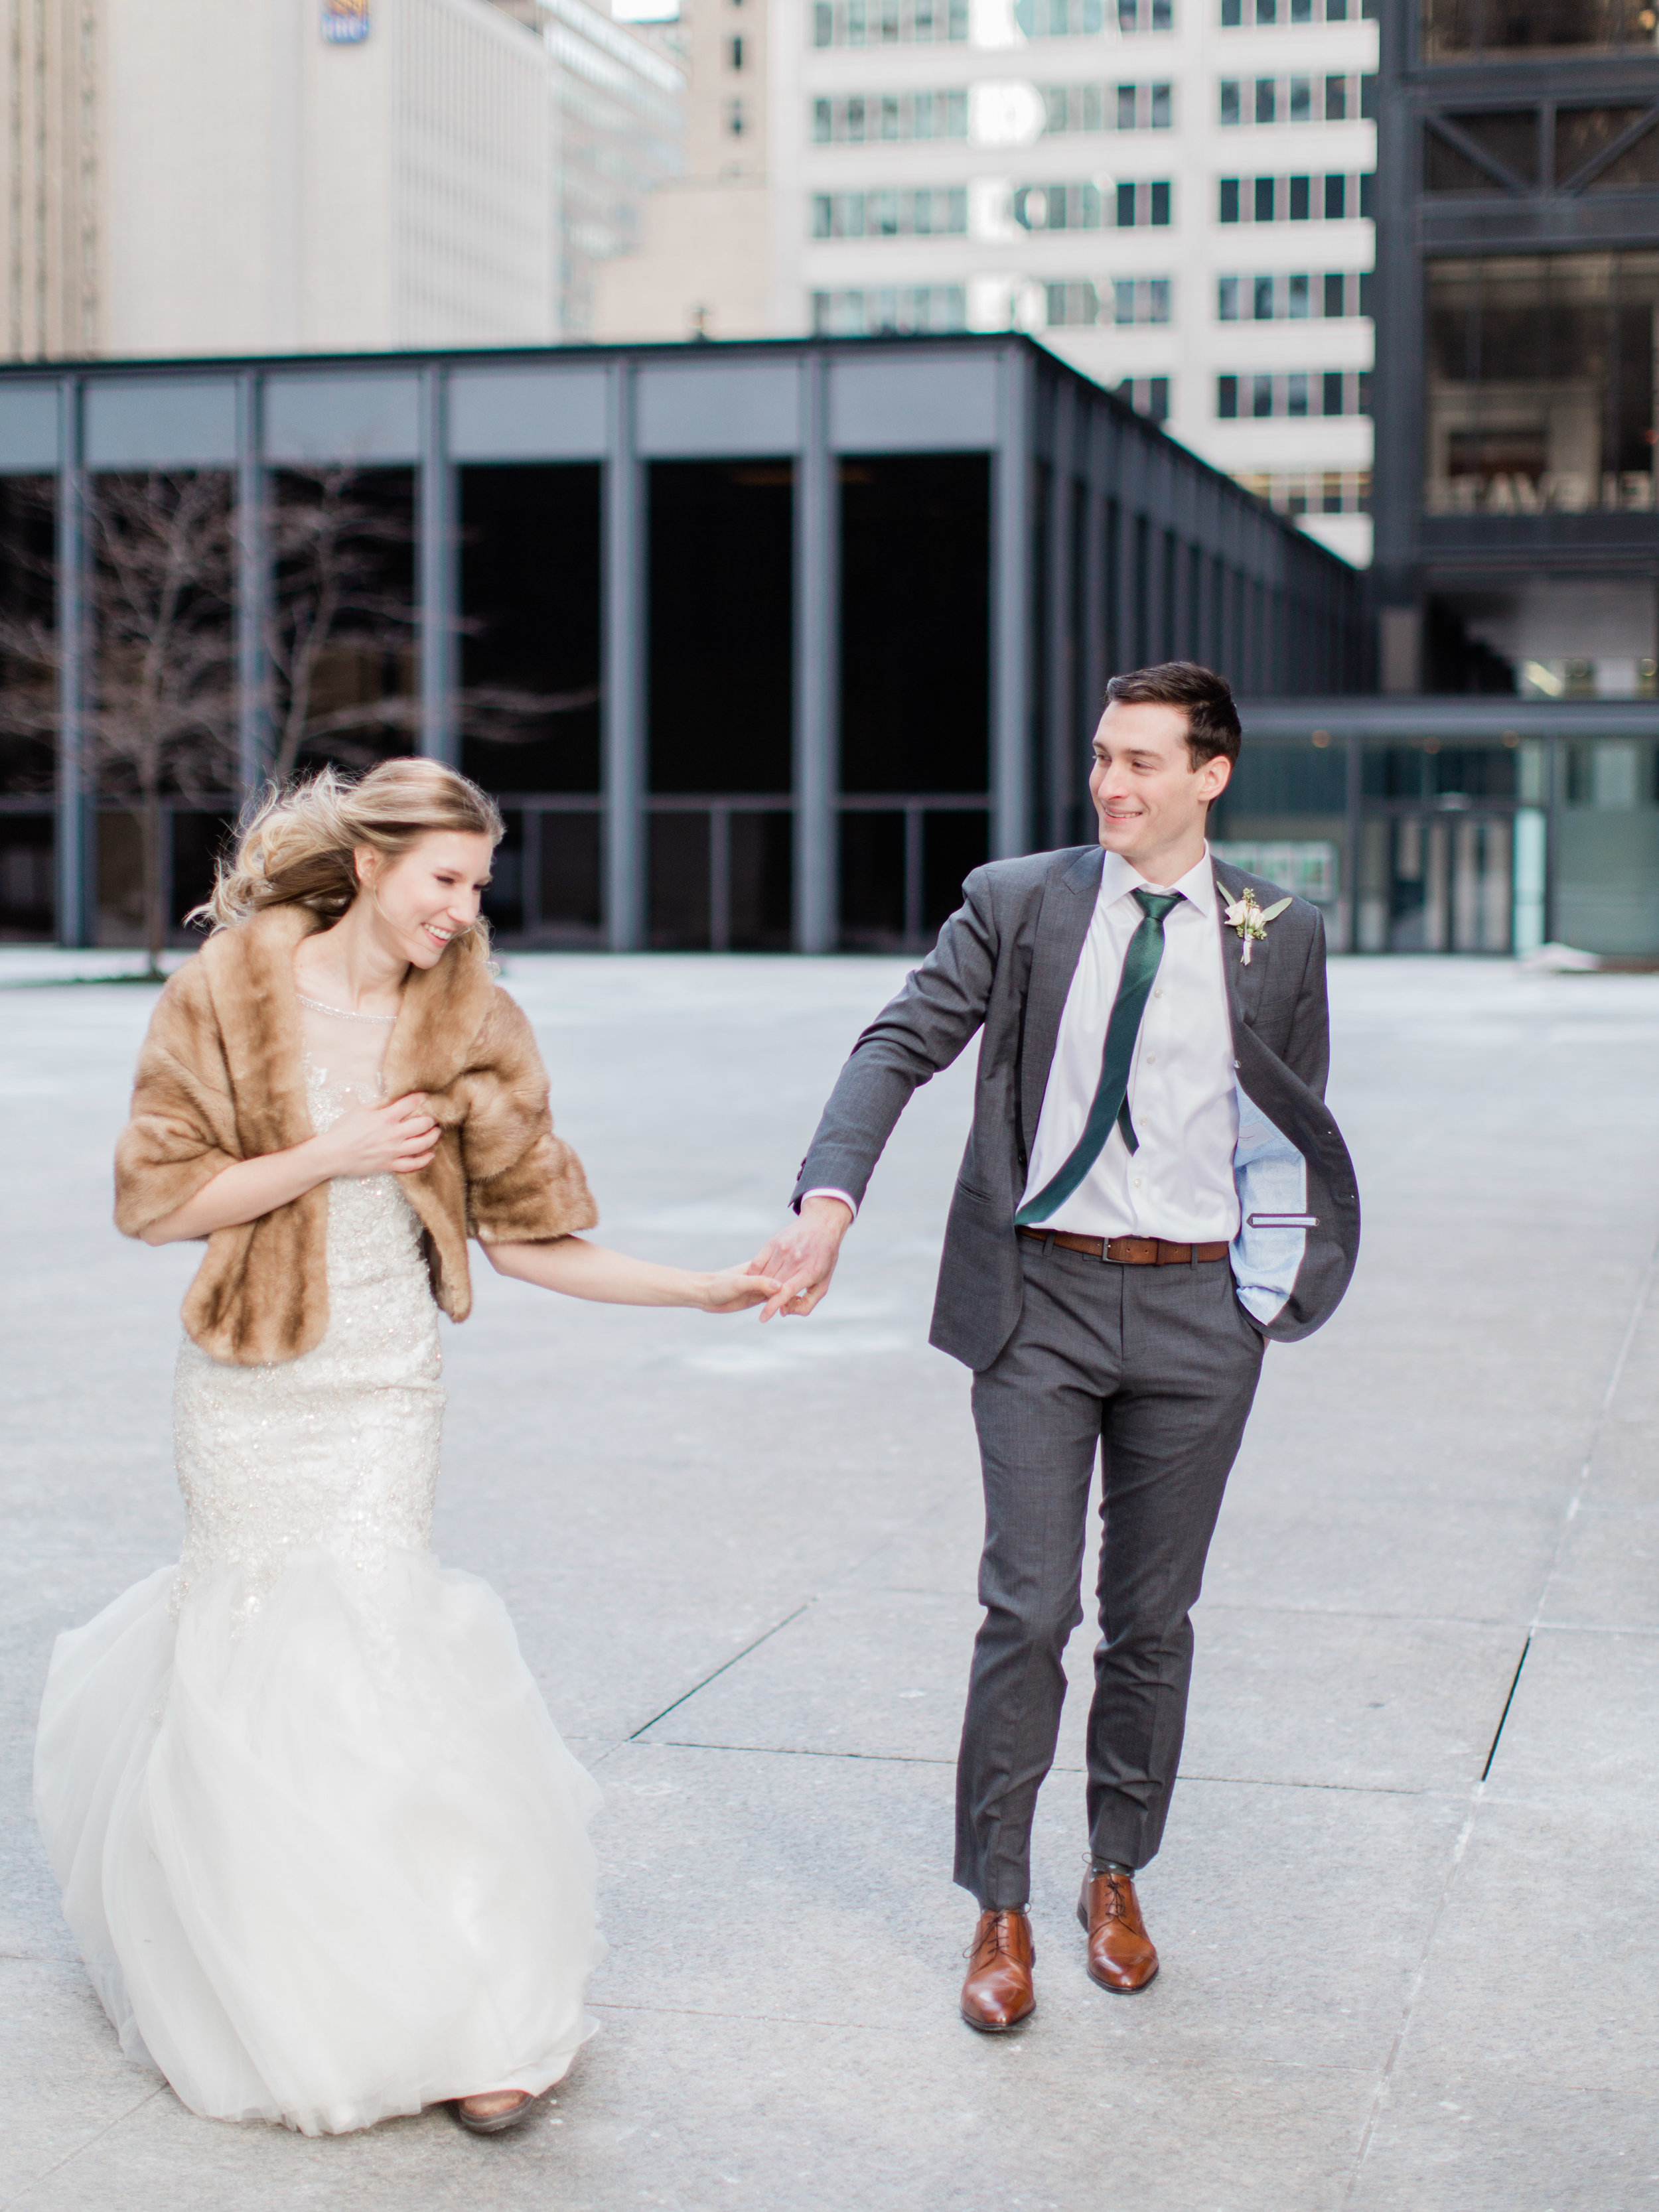 Toronto-wedding-photographer-downtown-winter-wedding-intimate-restaurant-canoe110.jpg